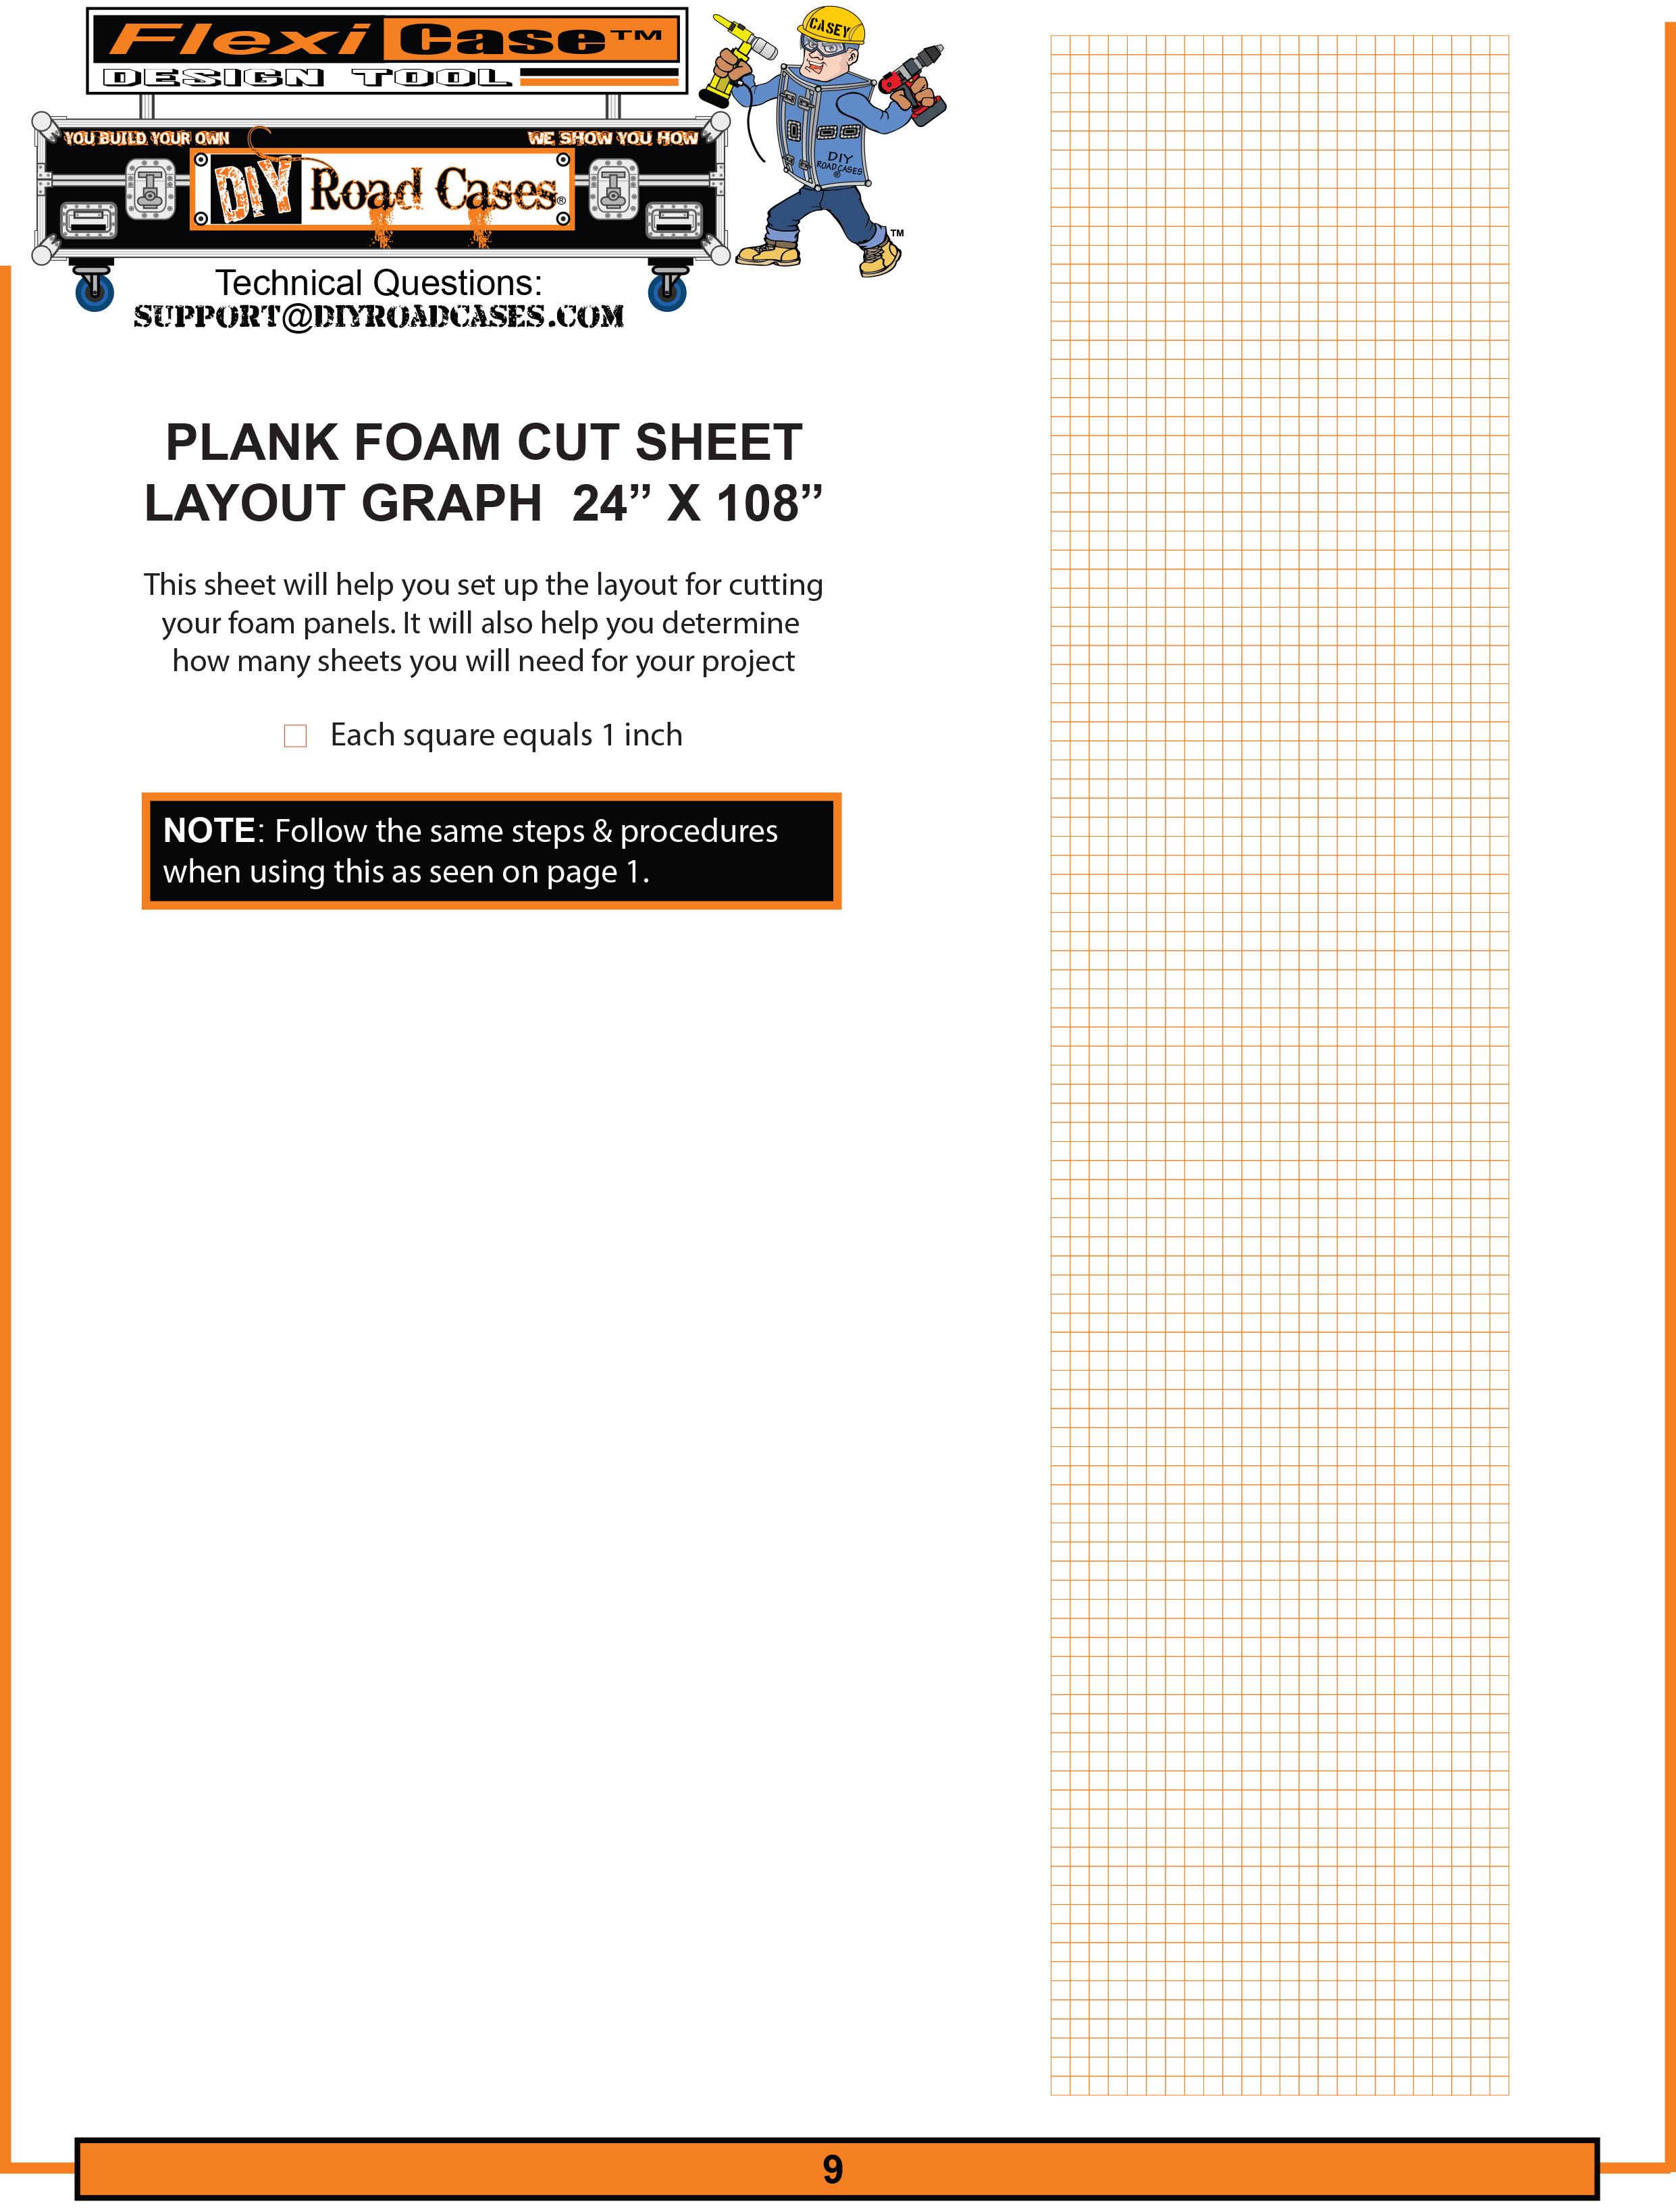 plank-foams-cut-sheet-layout-graph.jpg